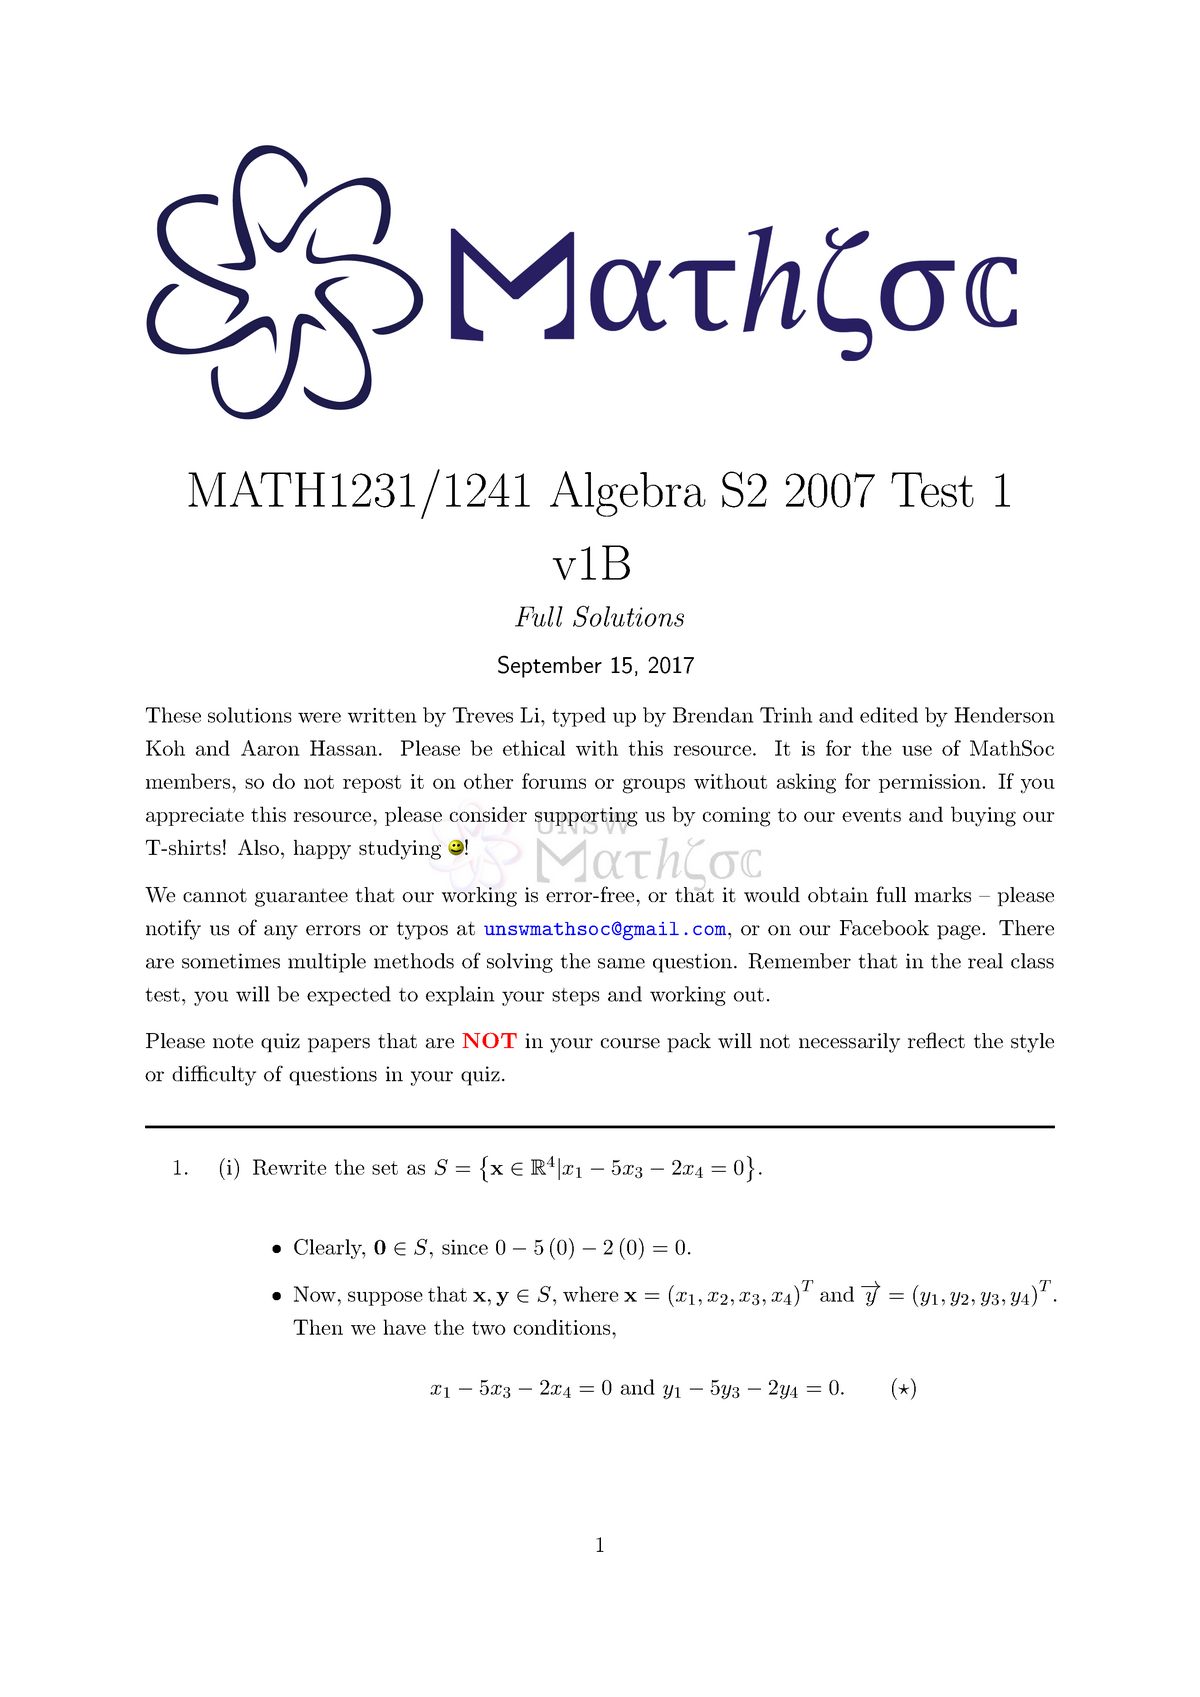 Exam 2018 - MATH1231: Mathematics 1B - StuDocu